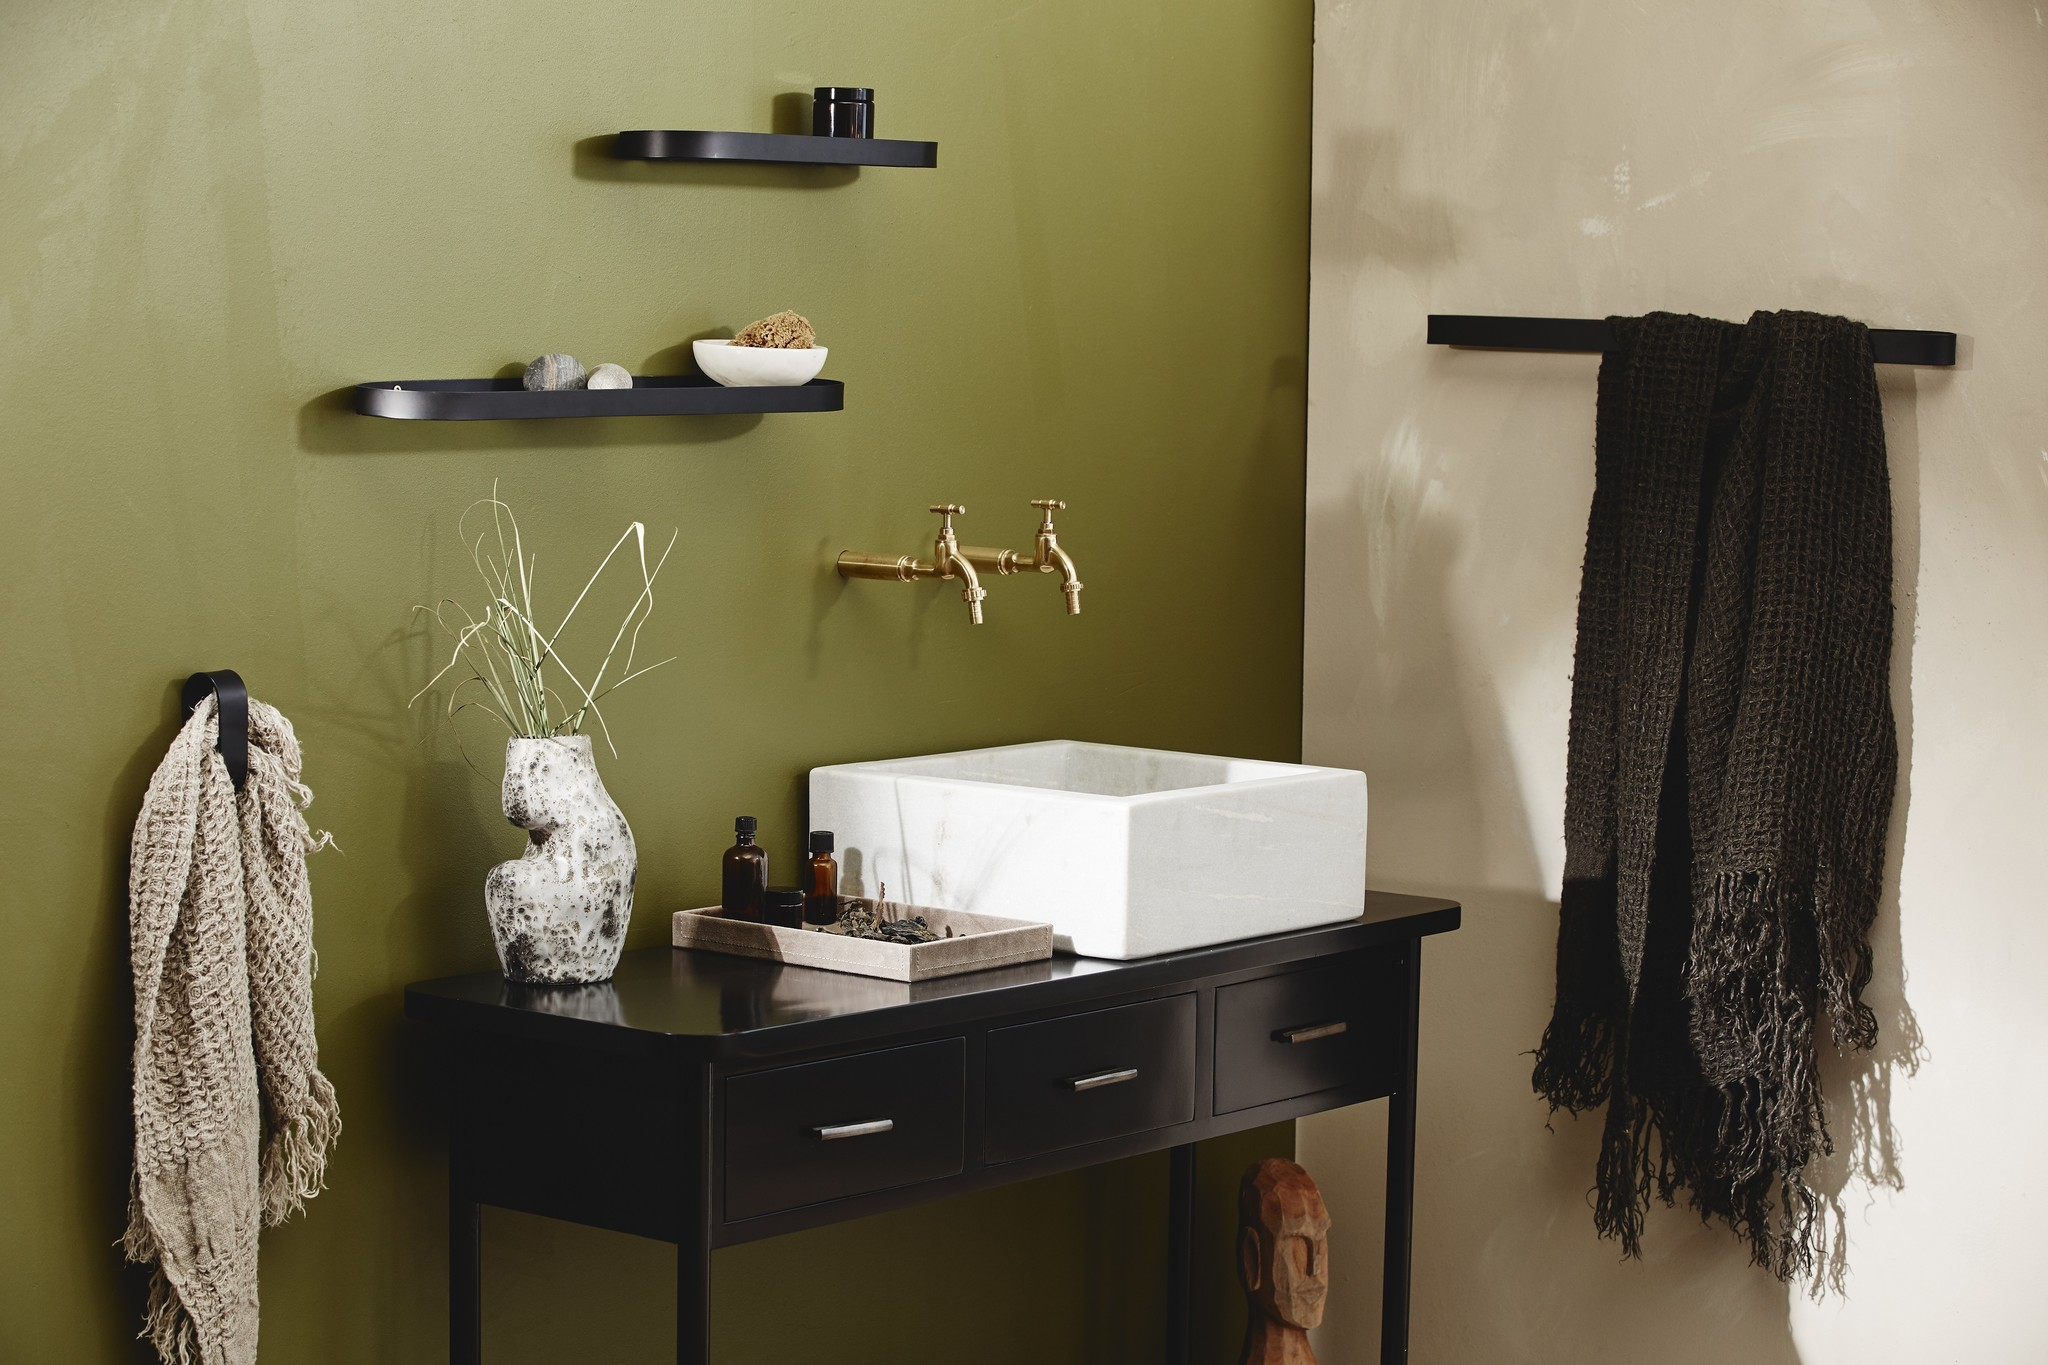 Nordal wall shelf Sotra, black